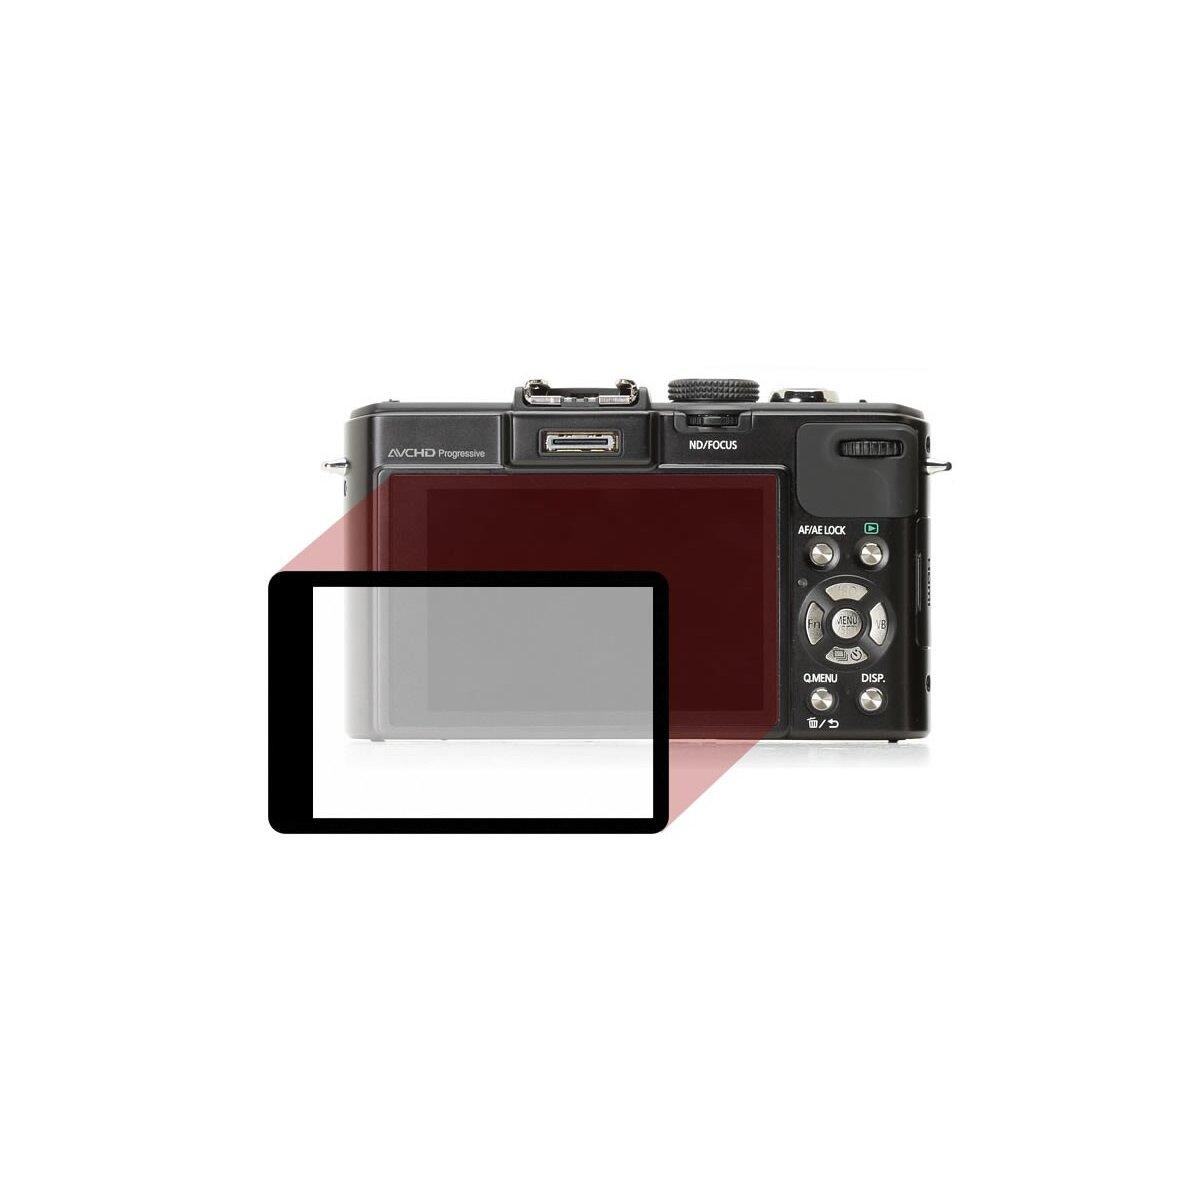 LCD Displayschutz Protector fuer Sony NEX-F3 - ersetzt Sony PCK-LM10